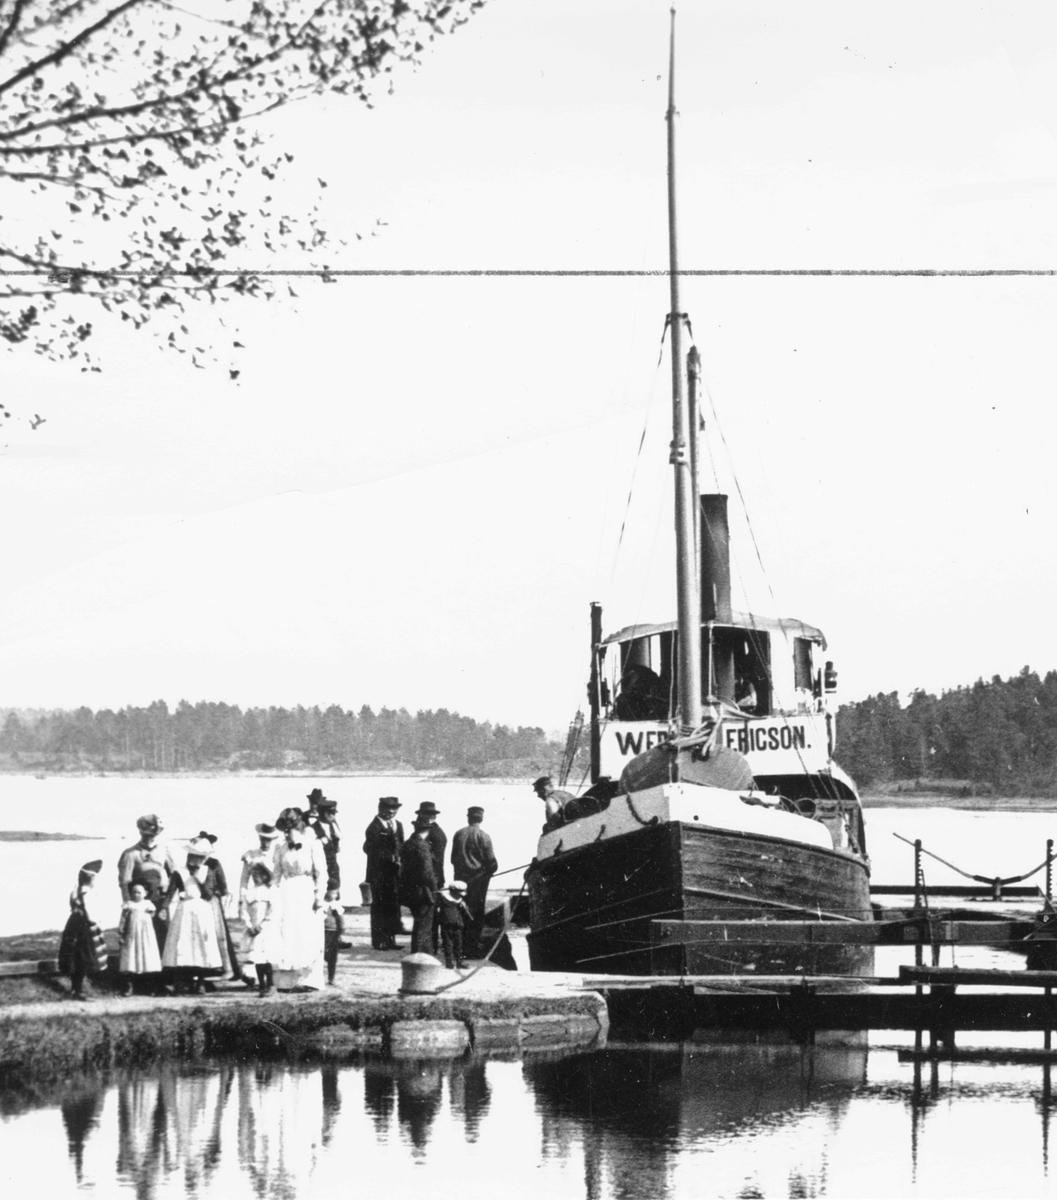 Dalslands kanal, Håverud